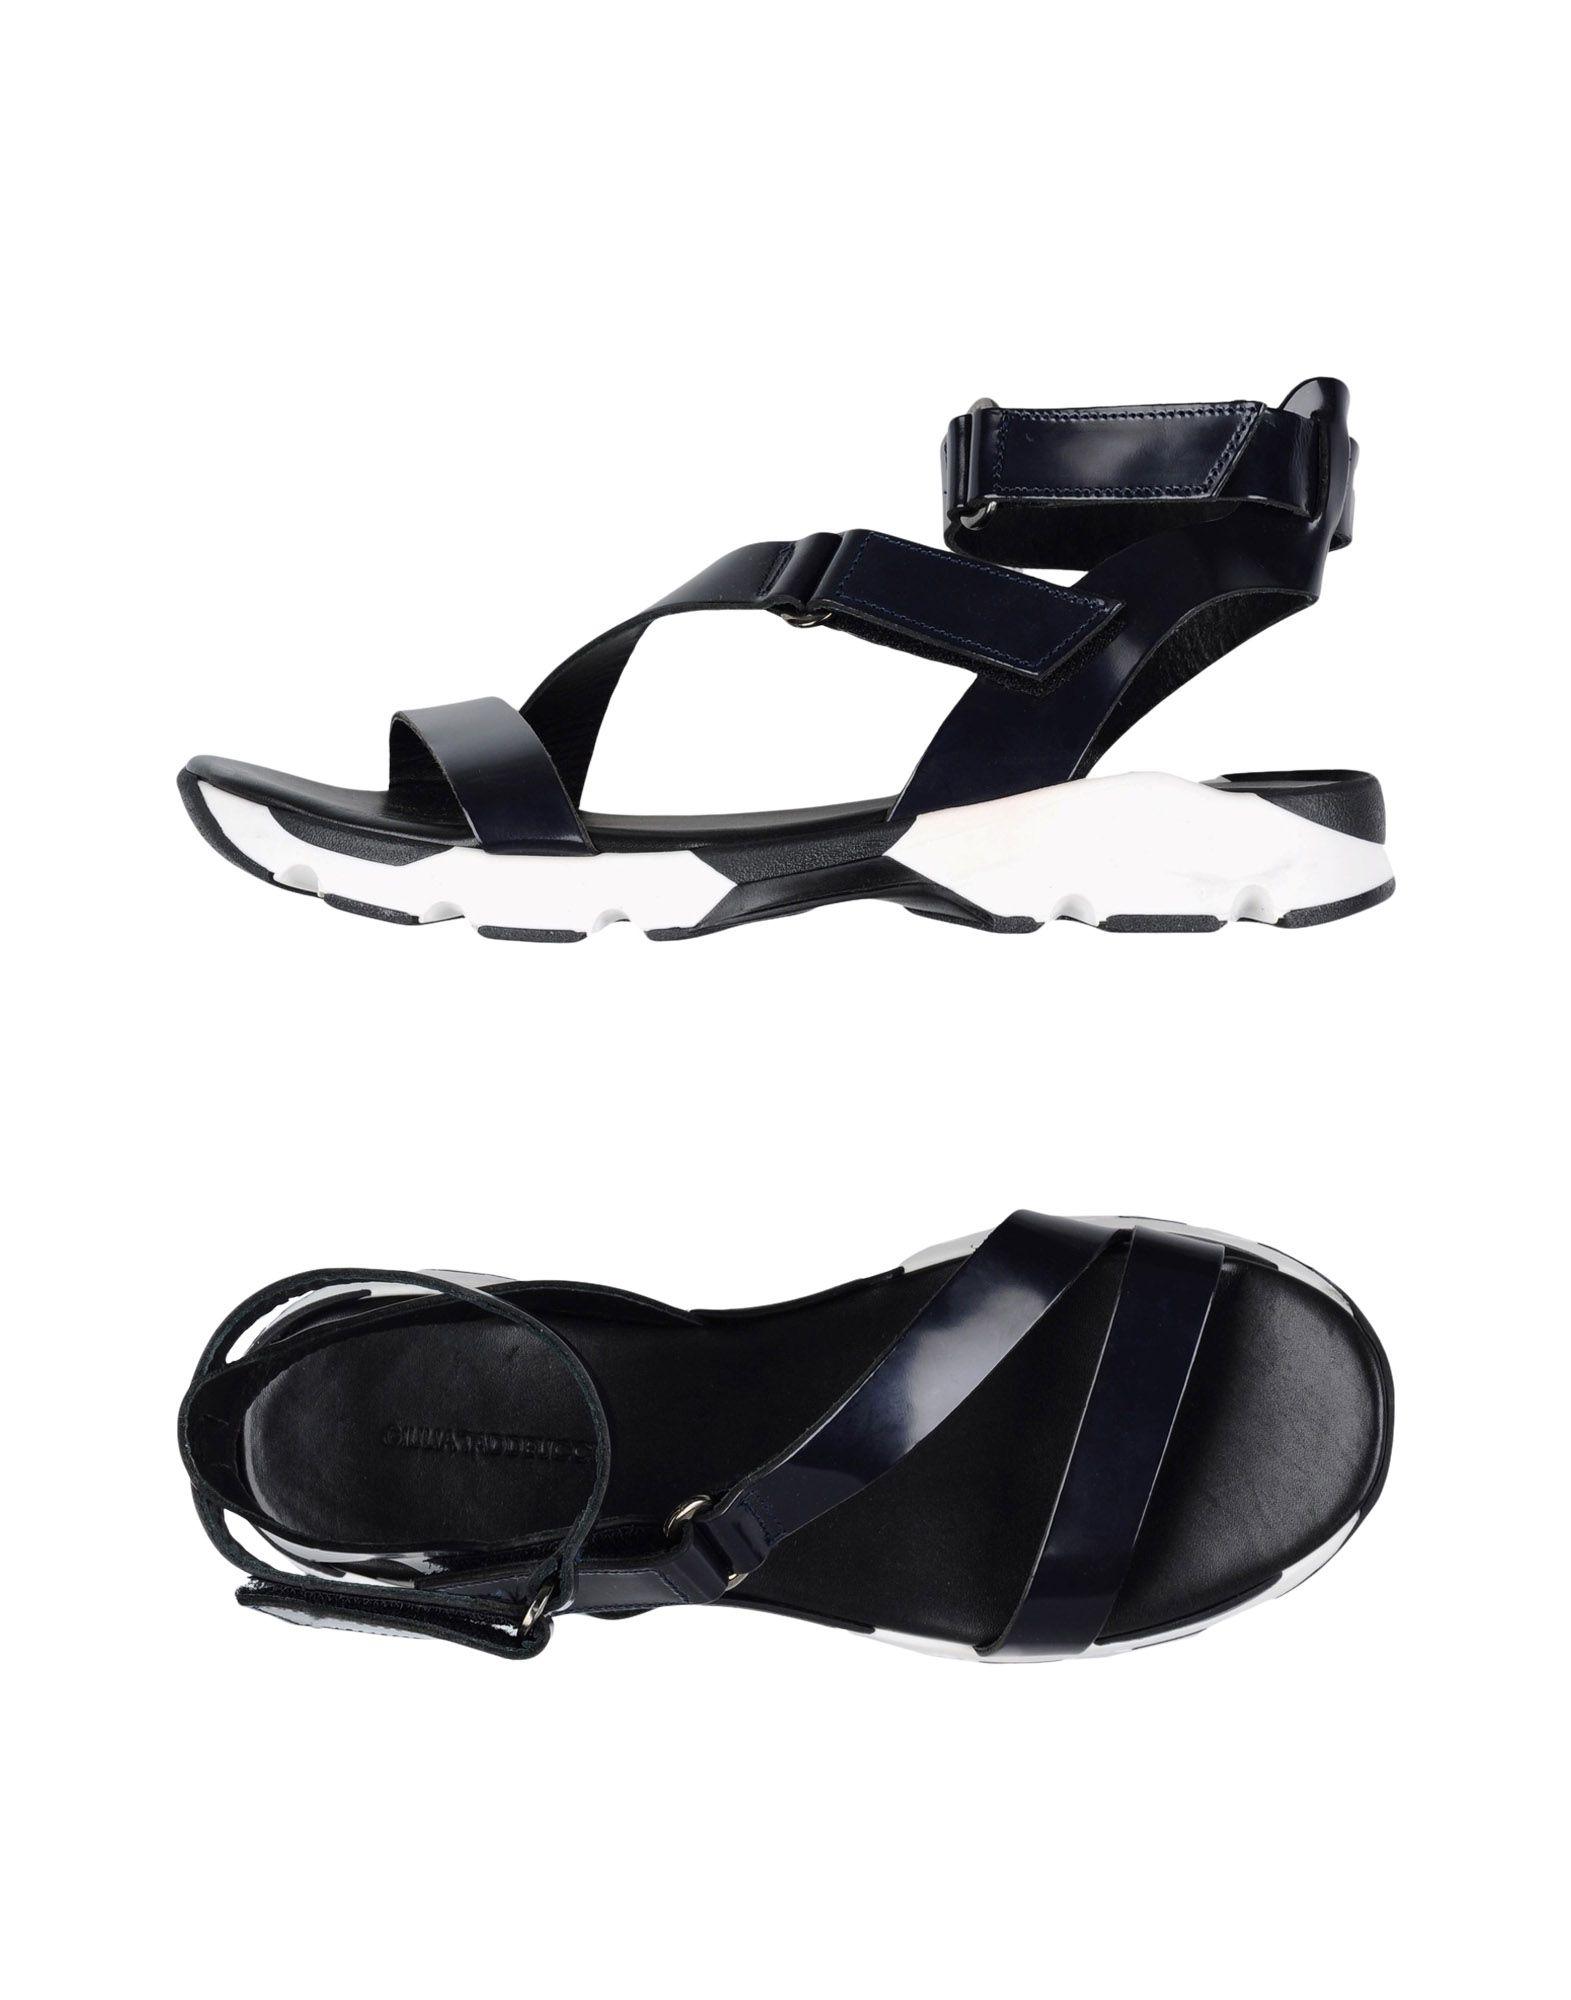 Chaussures - Tribunaux Giulia Taddeucci wS0uT